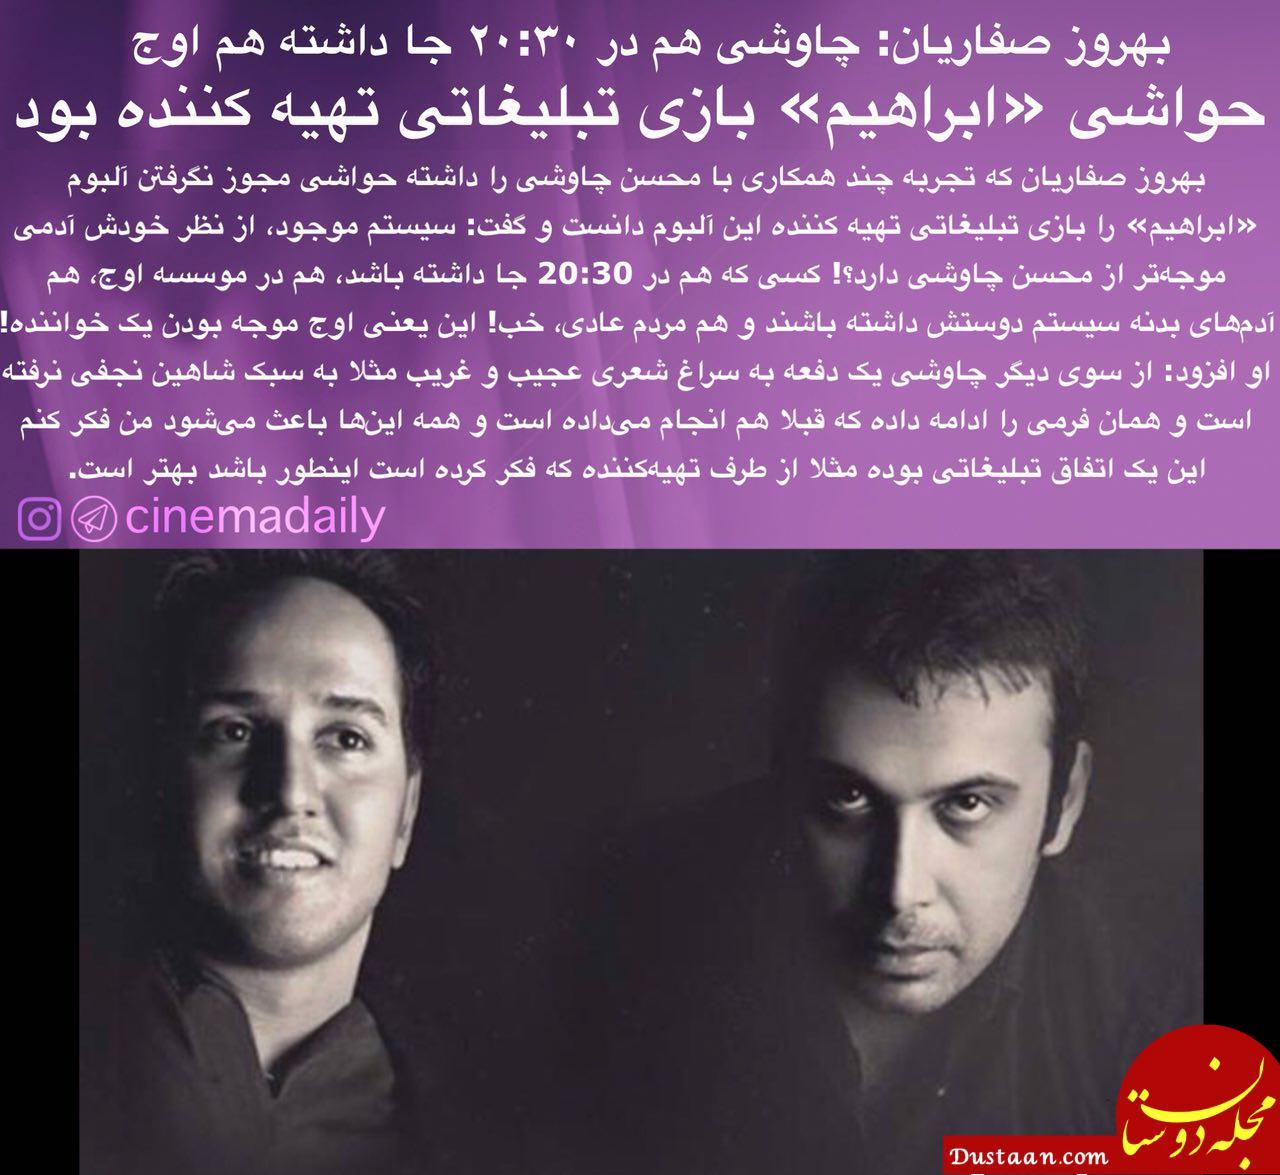 www.dustaan.com بهروز صفاریان:مجوز نگرفتن آلبوم «ابراهیم»بازی تبلیغاتی تهیه کننده اش بود